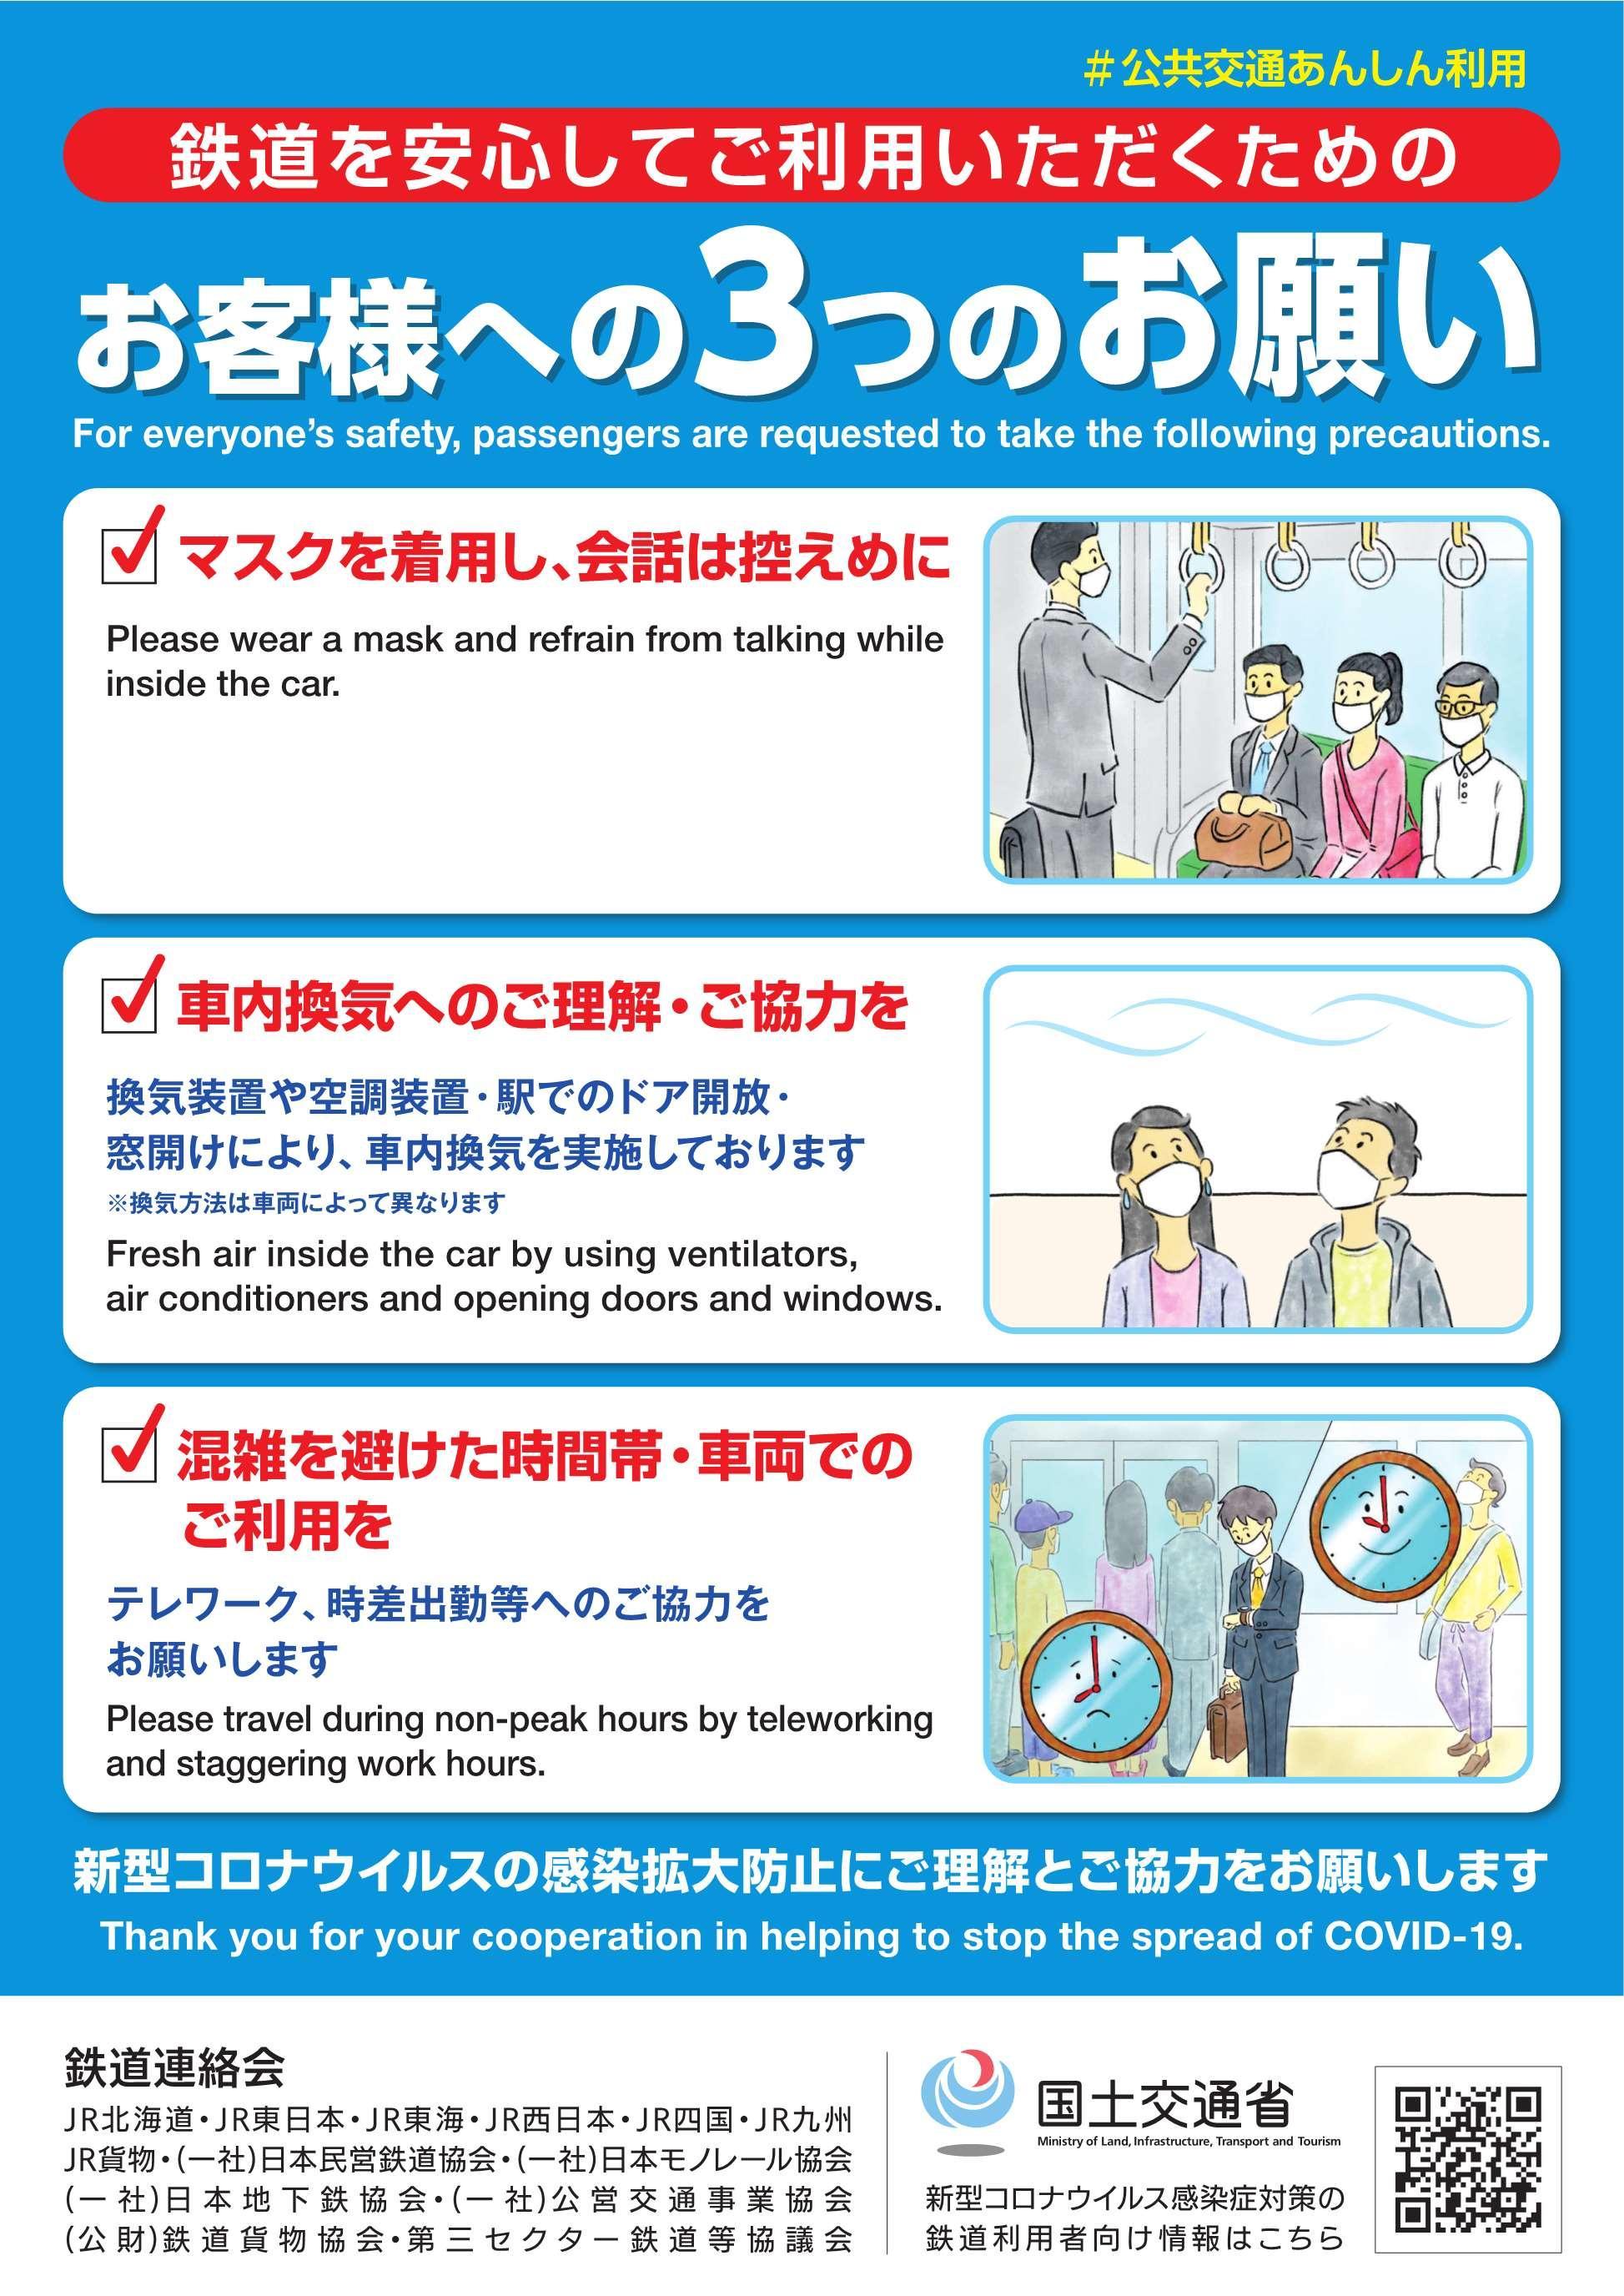 https://blogs.itmedia.co.jp/yasusasaki/001350607.jpg